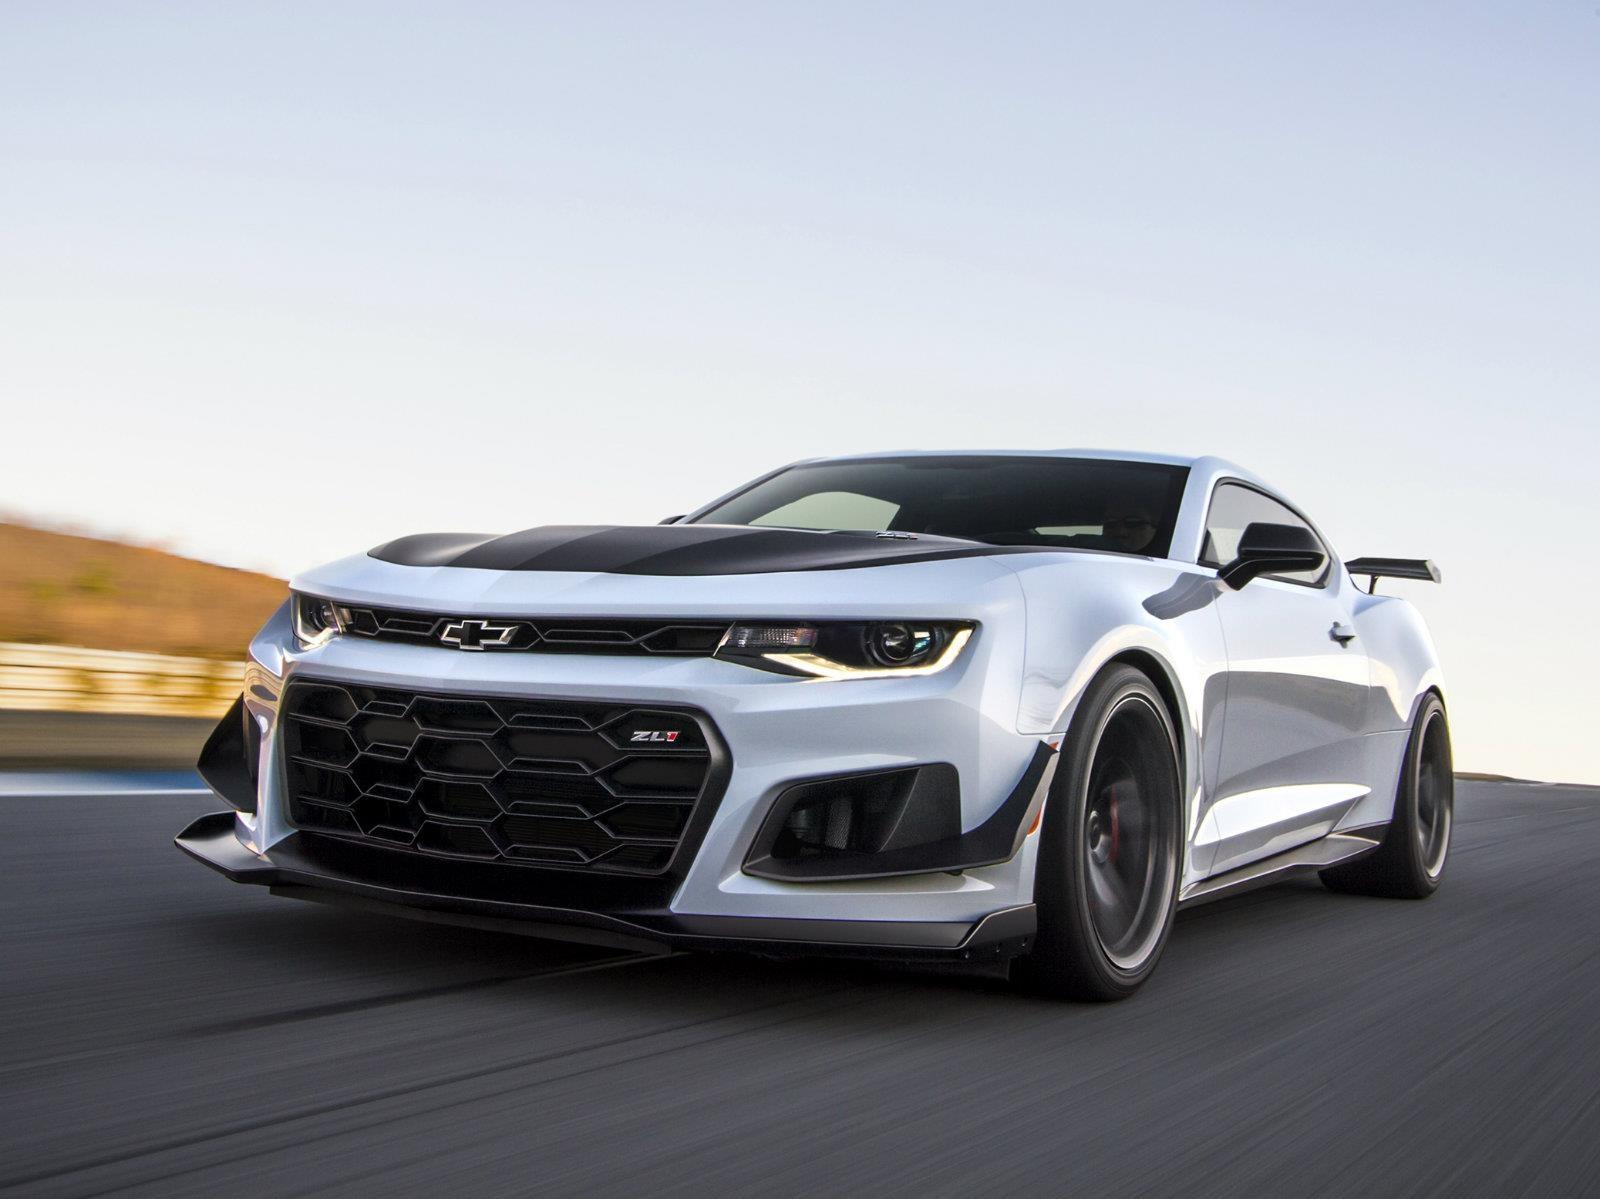 Chevrolet Camaro ZL1 1LE Extreme Track Performance debuta